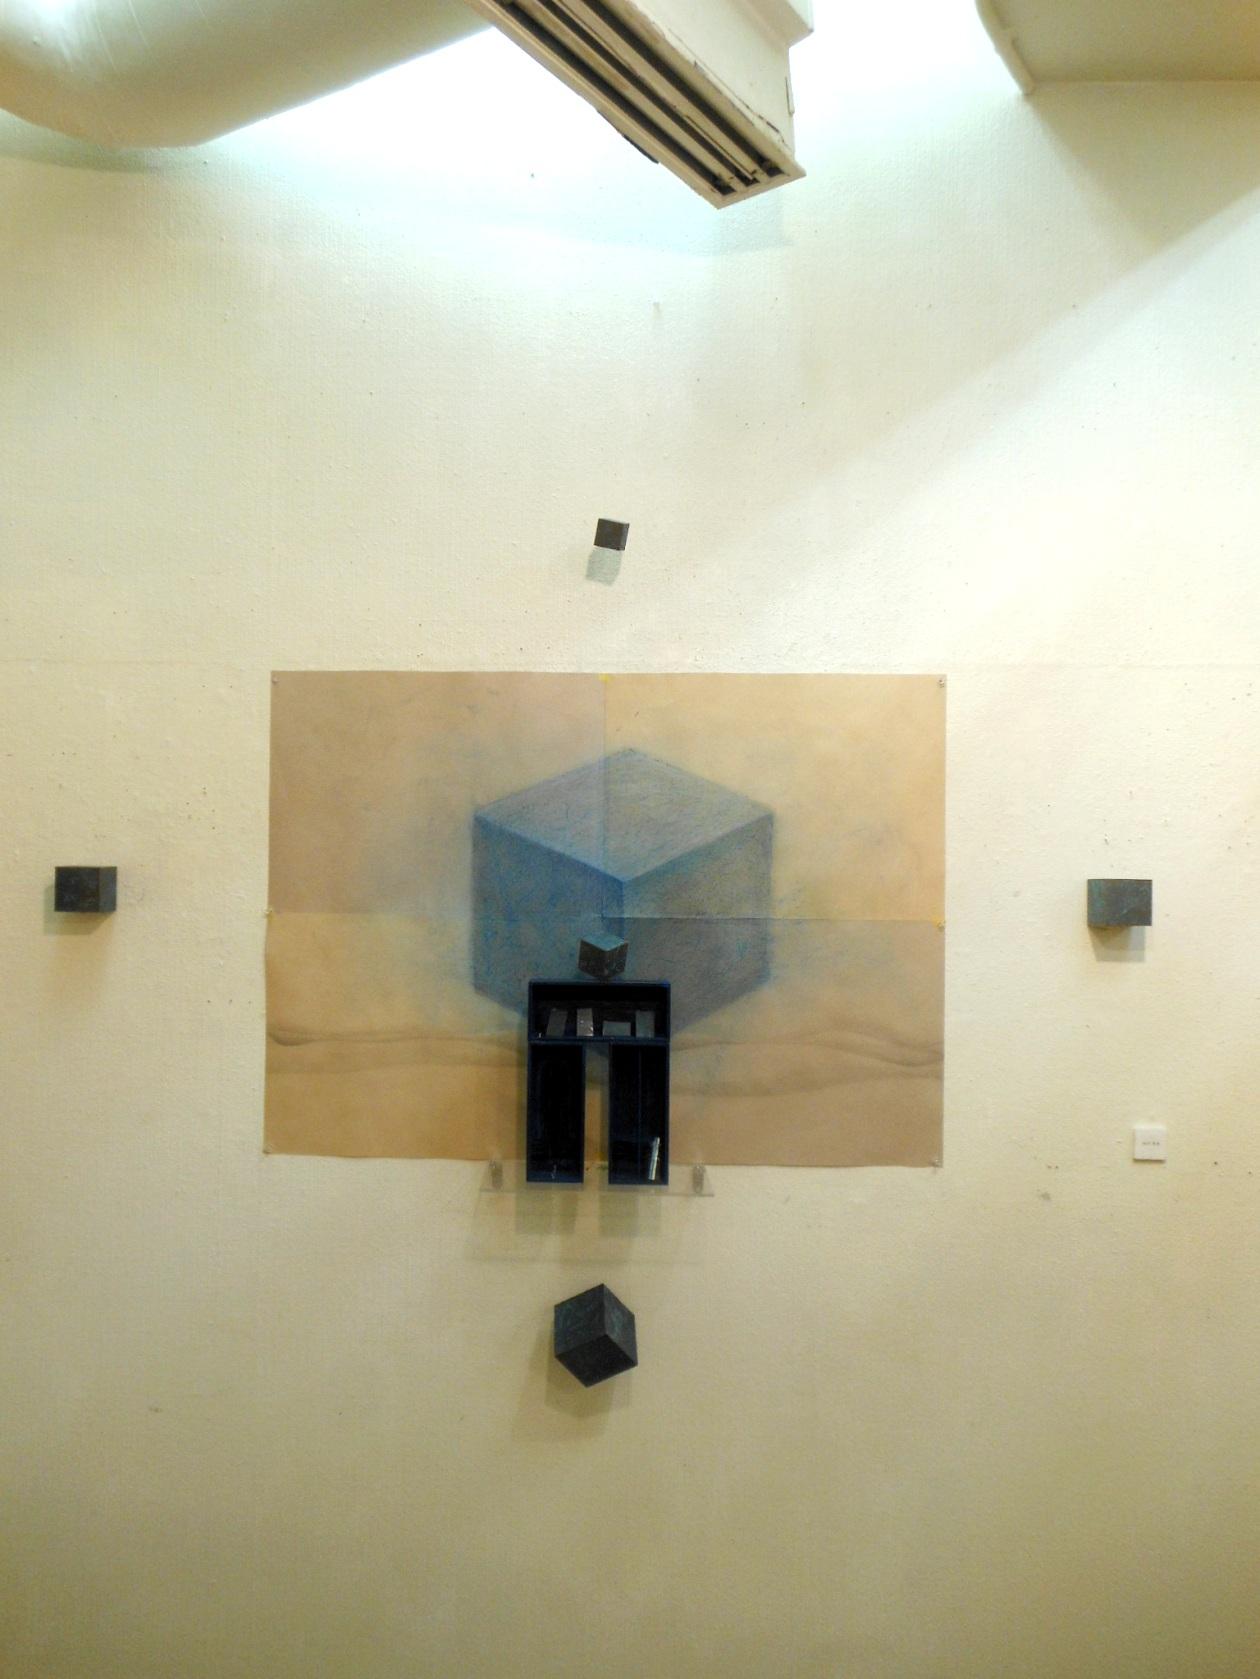 1741)「BOX ART 6 」 たぴお 5月7日(月)~5月12日(土)  _f0126829_9153557.jpg